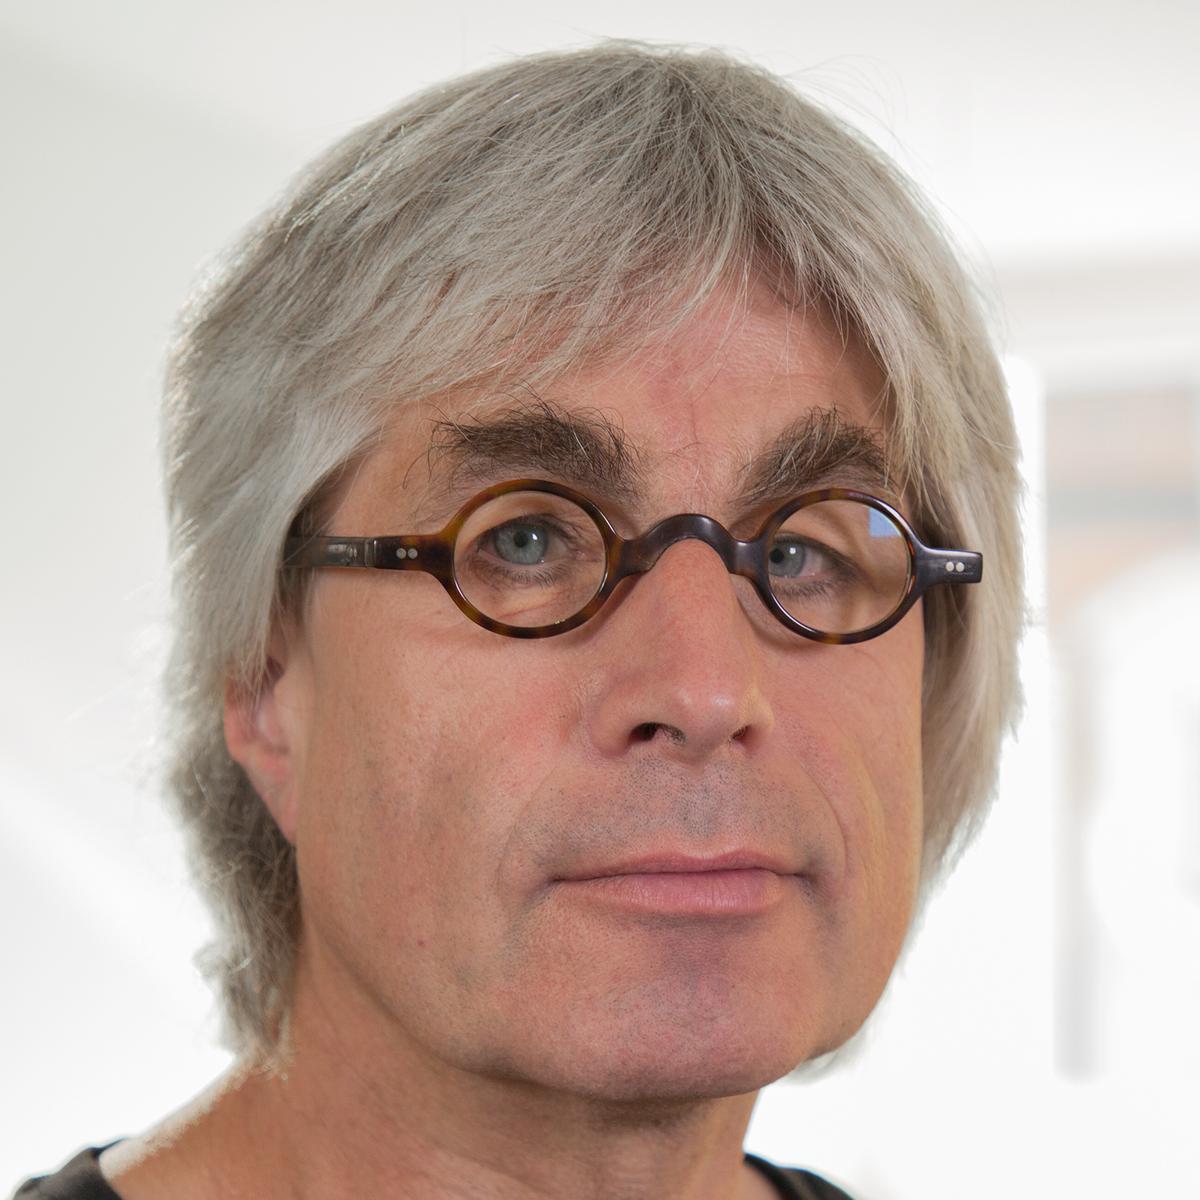 Roland Biswurm